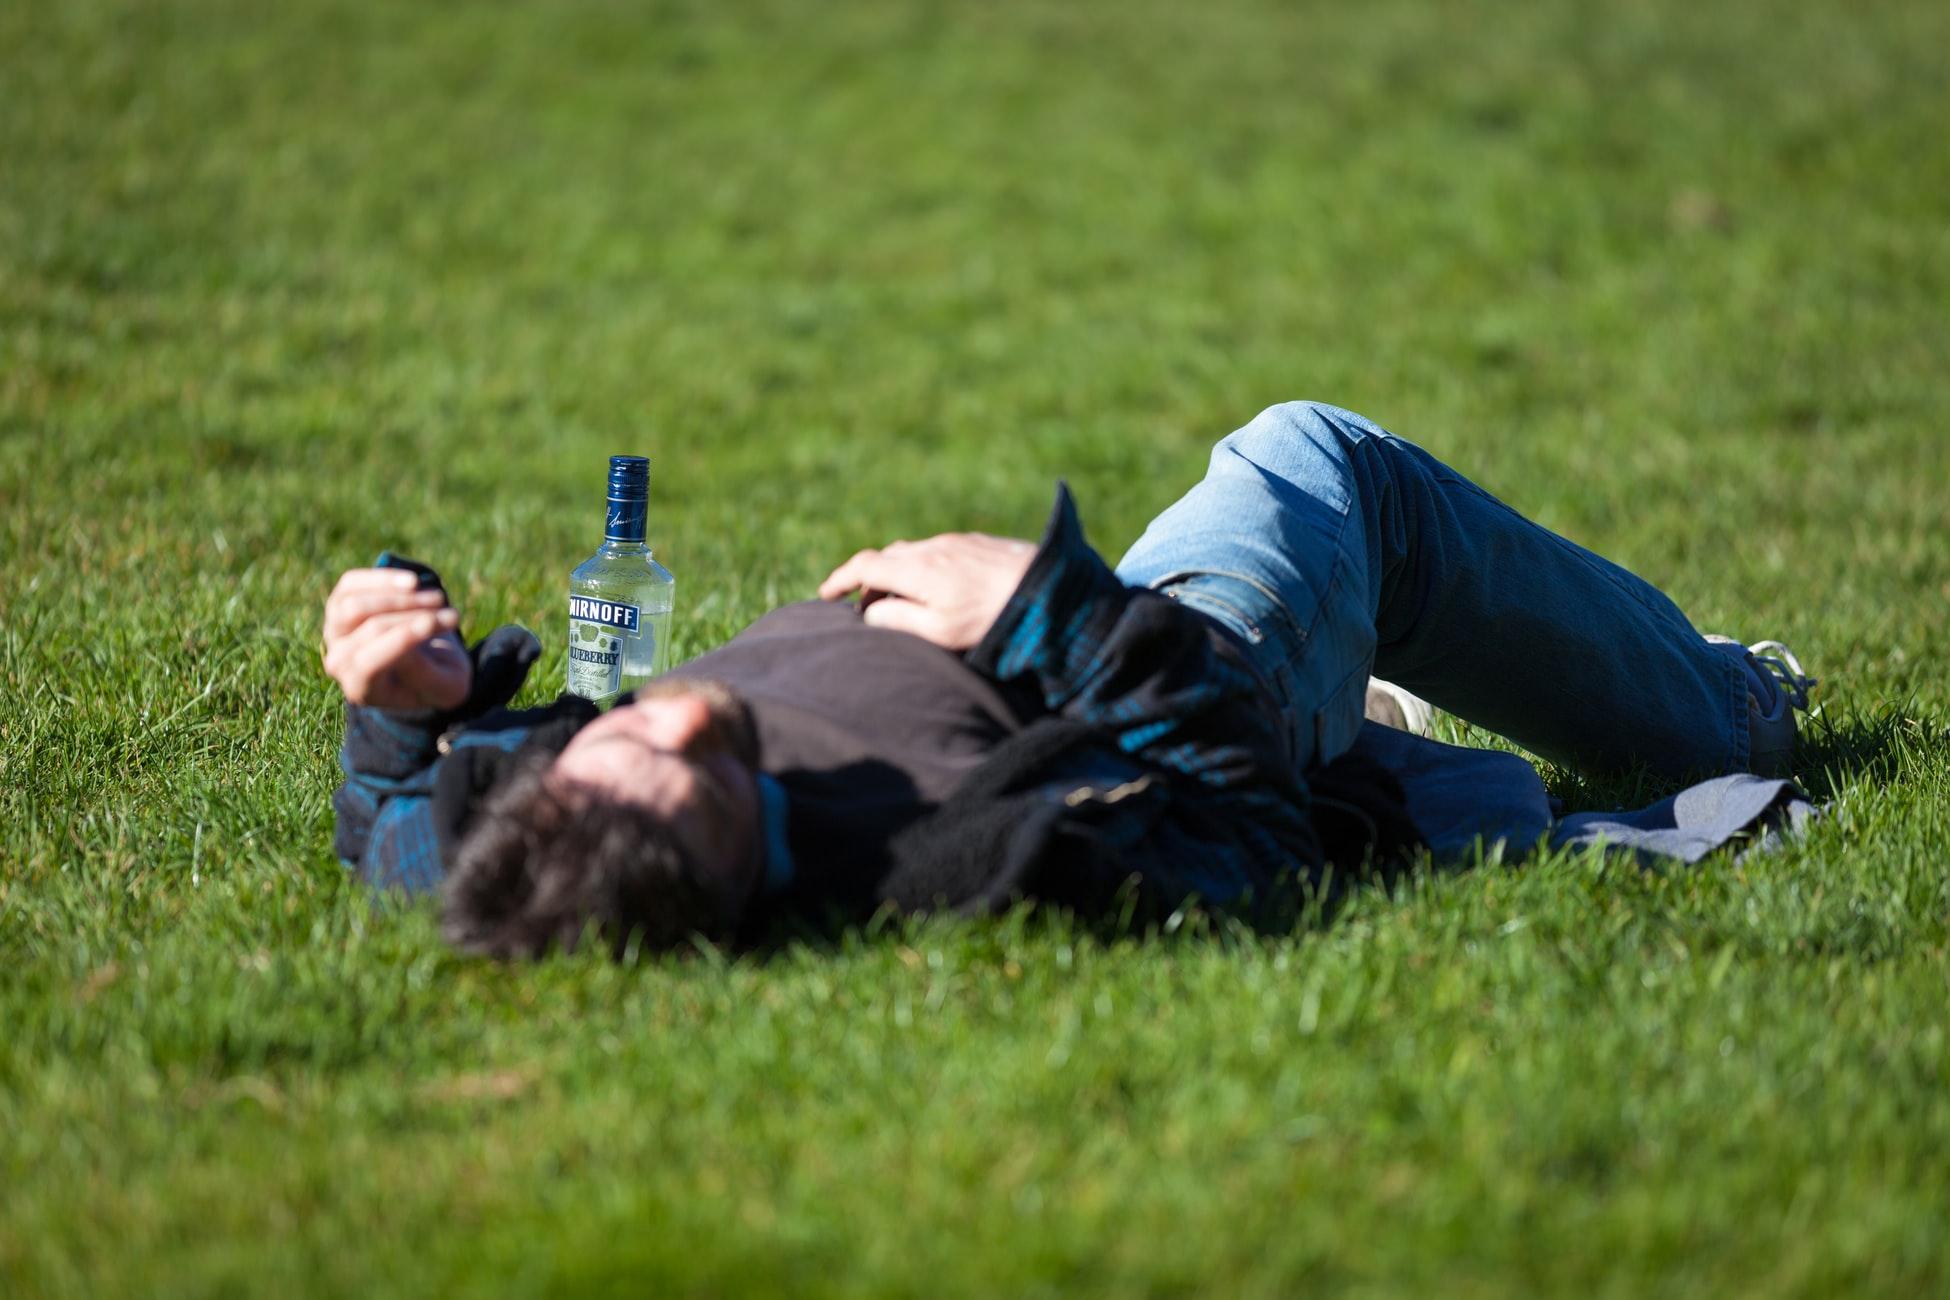 verslaving fases, verslaving symptomen